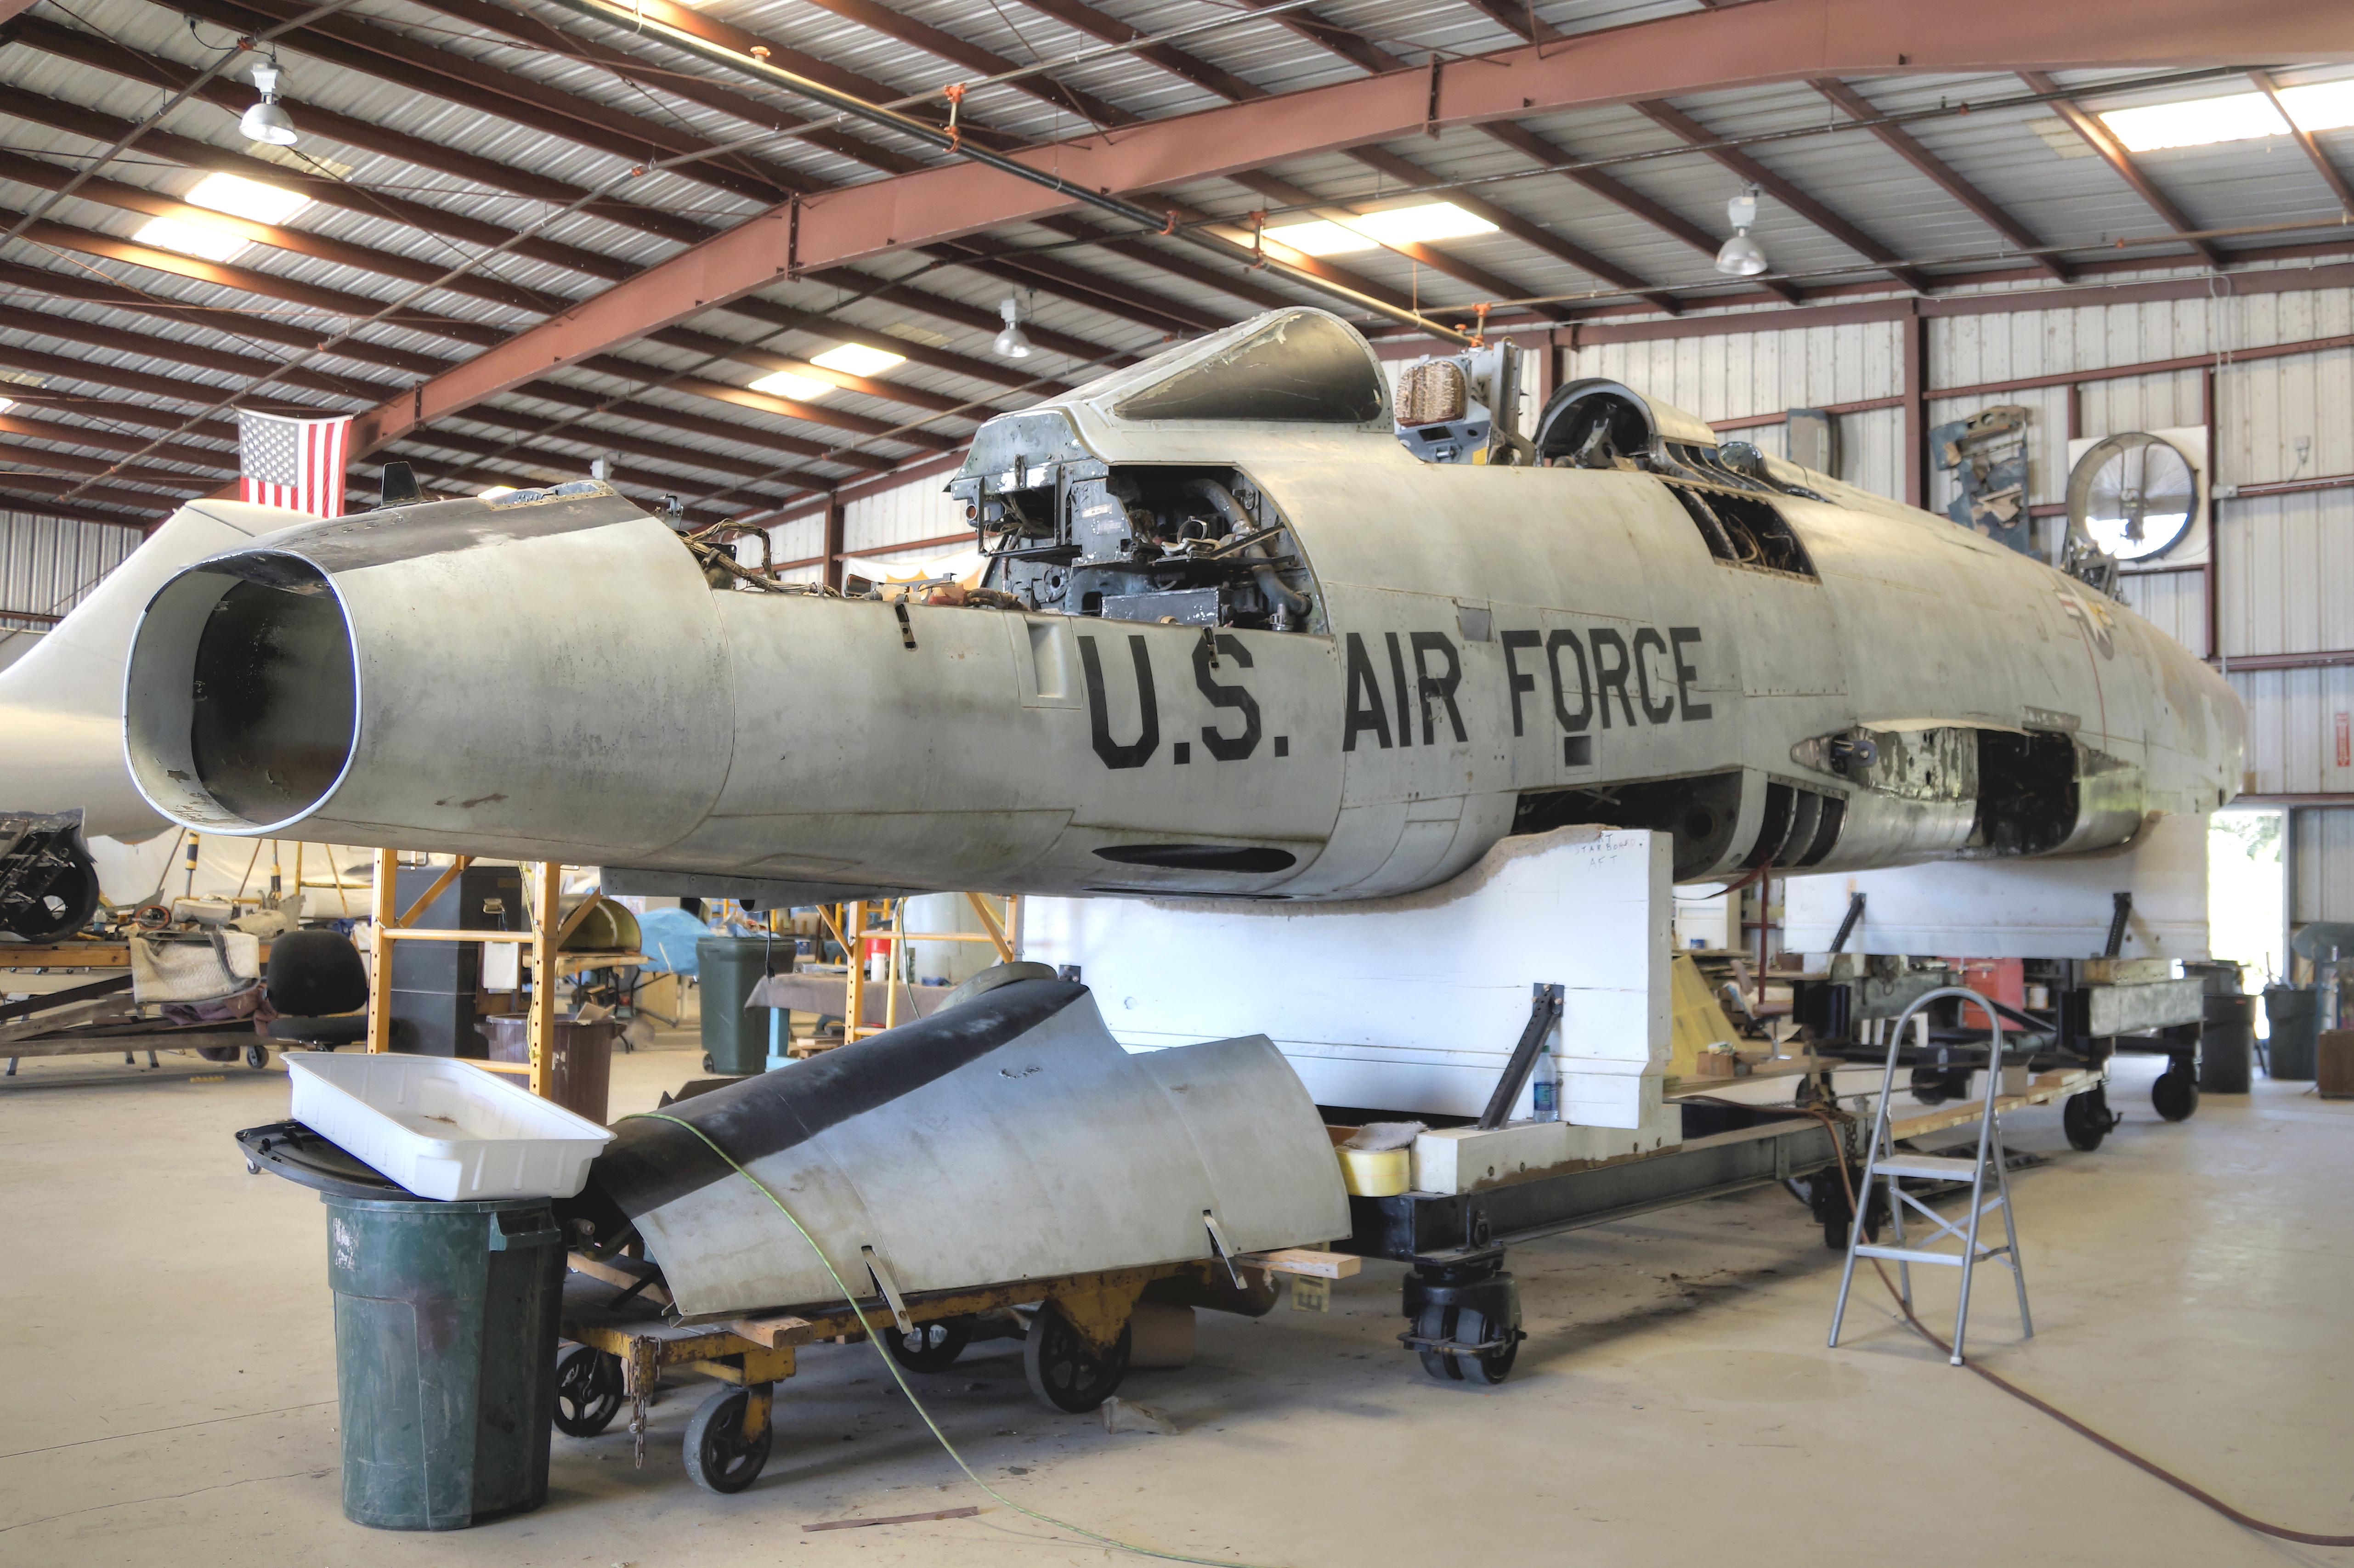 2871_3 F-100 restor HDR 6-25-16